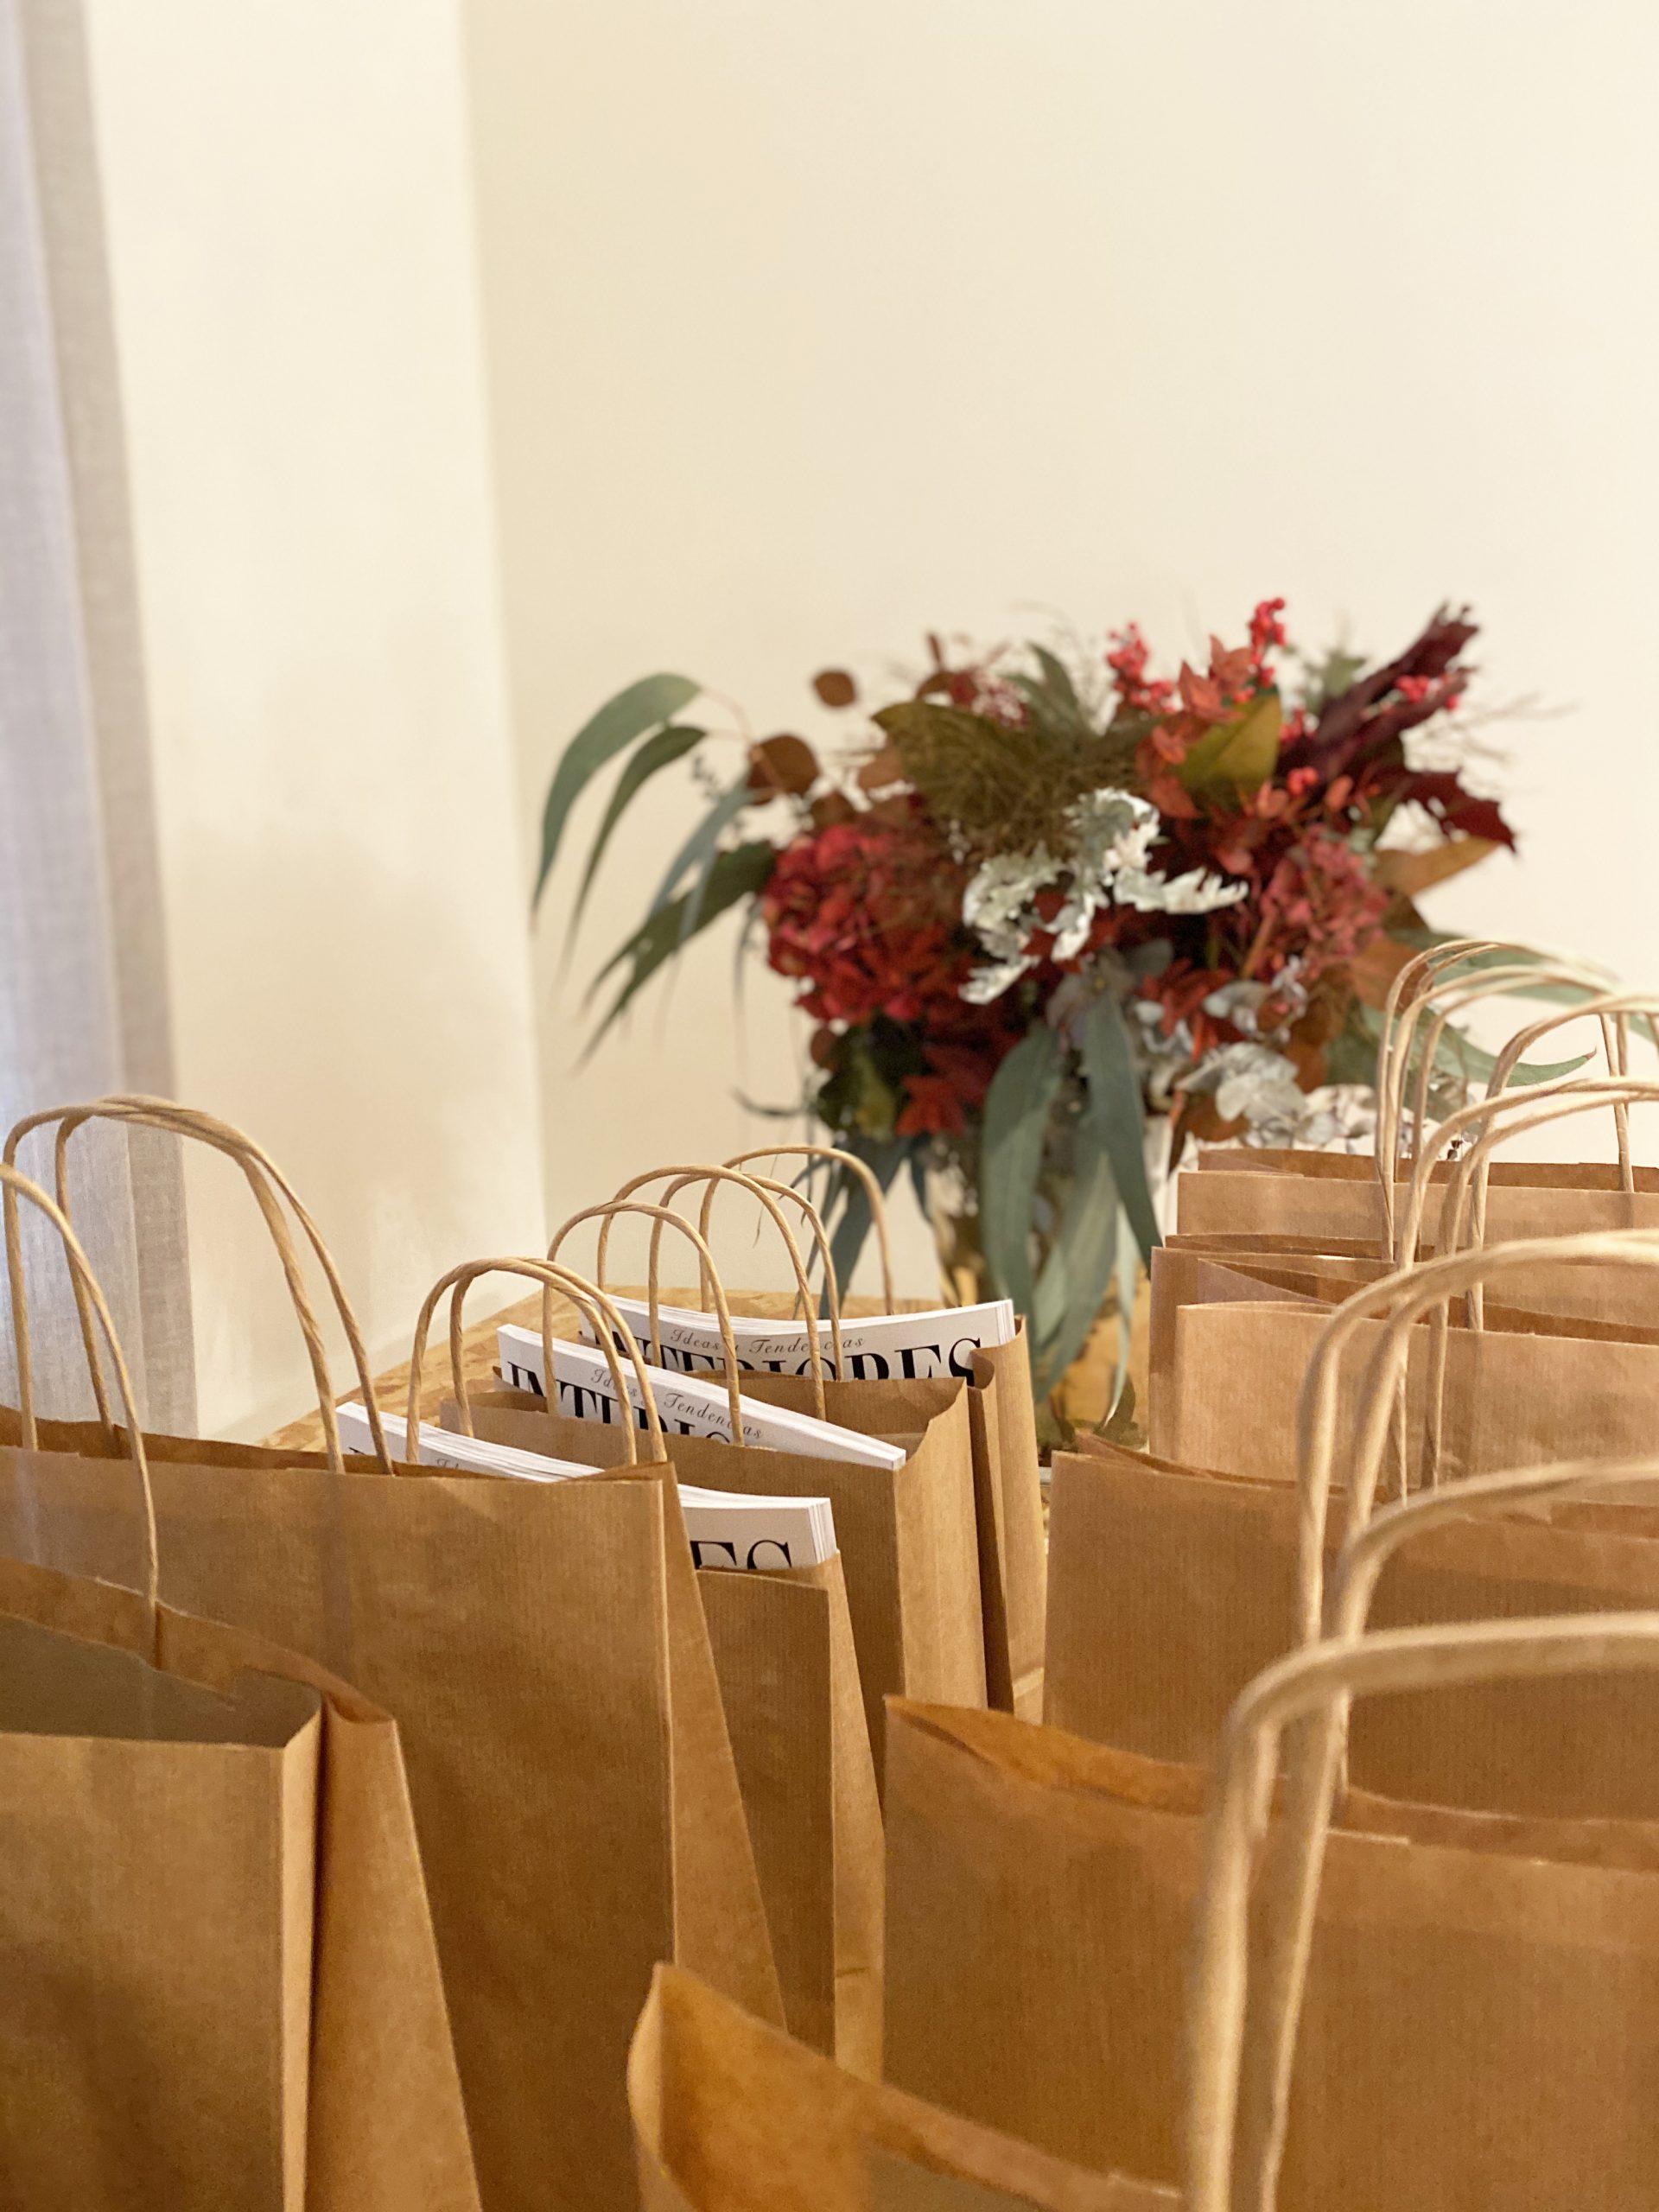 The Inspiration House regalos bolsa navidad